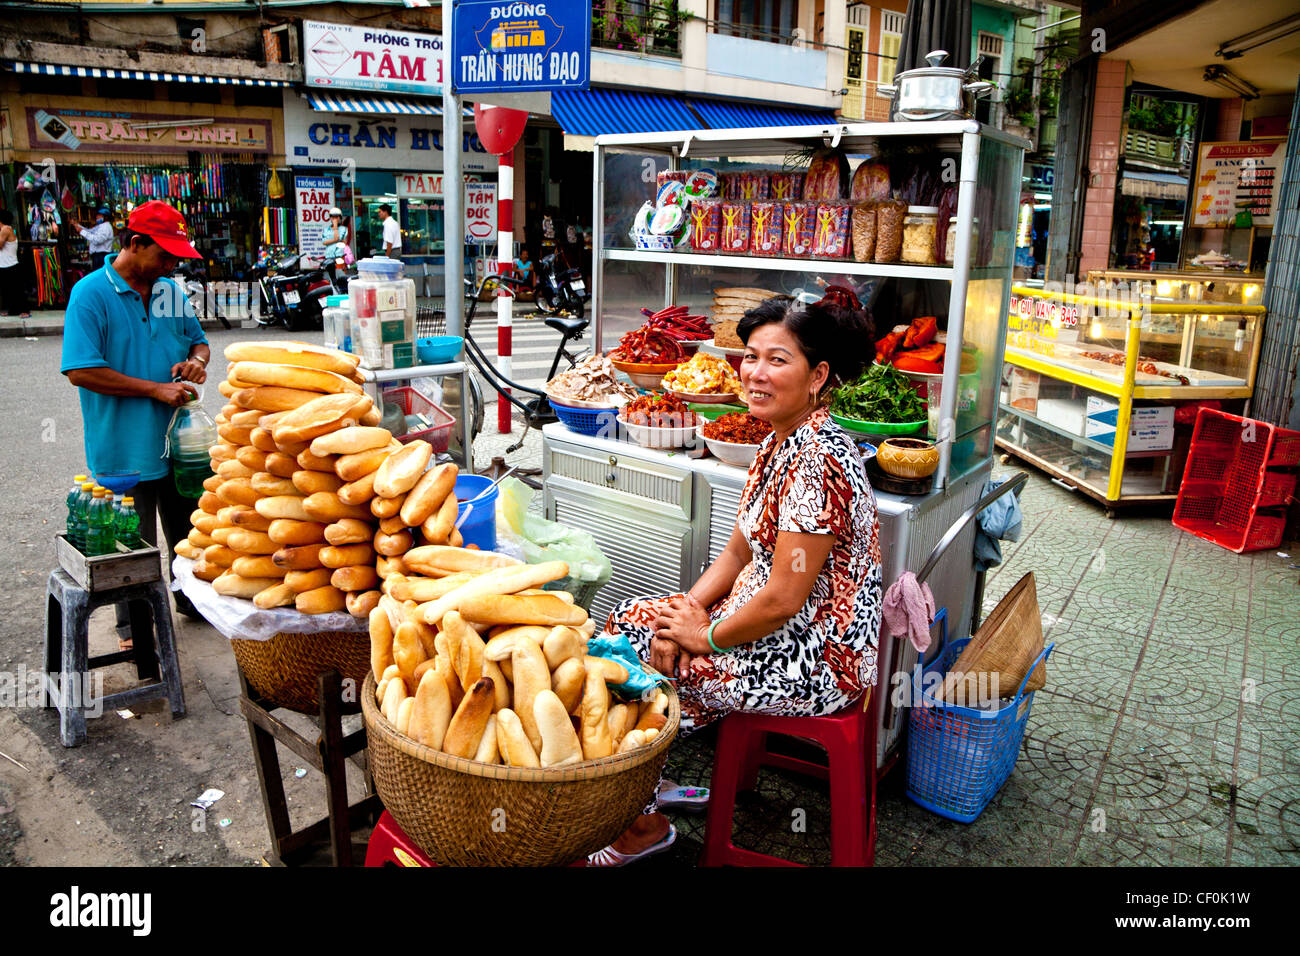 A street vendor selling the Vietnamese sandwich, banh mi, in Da nang, Vietnam - Stock Image